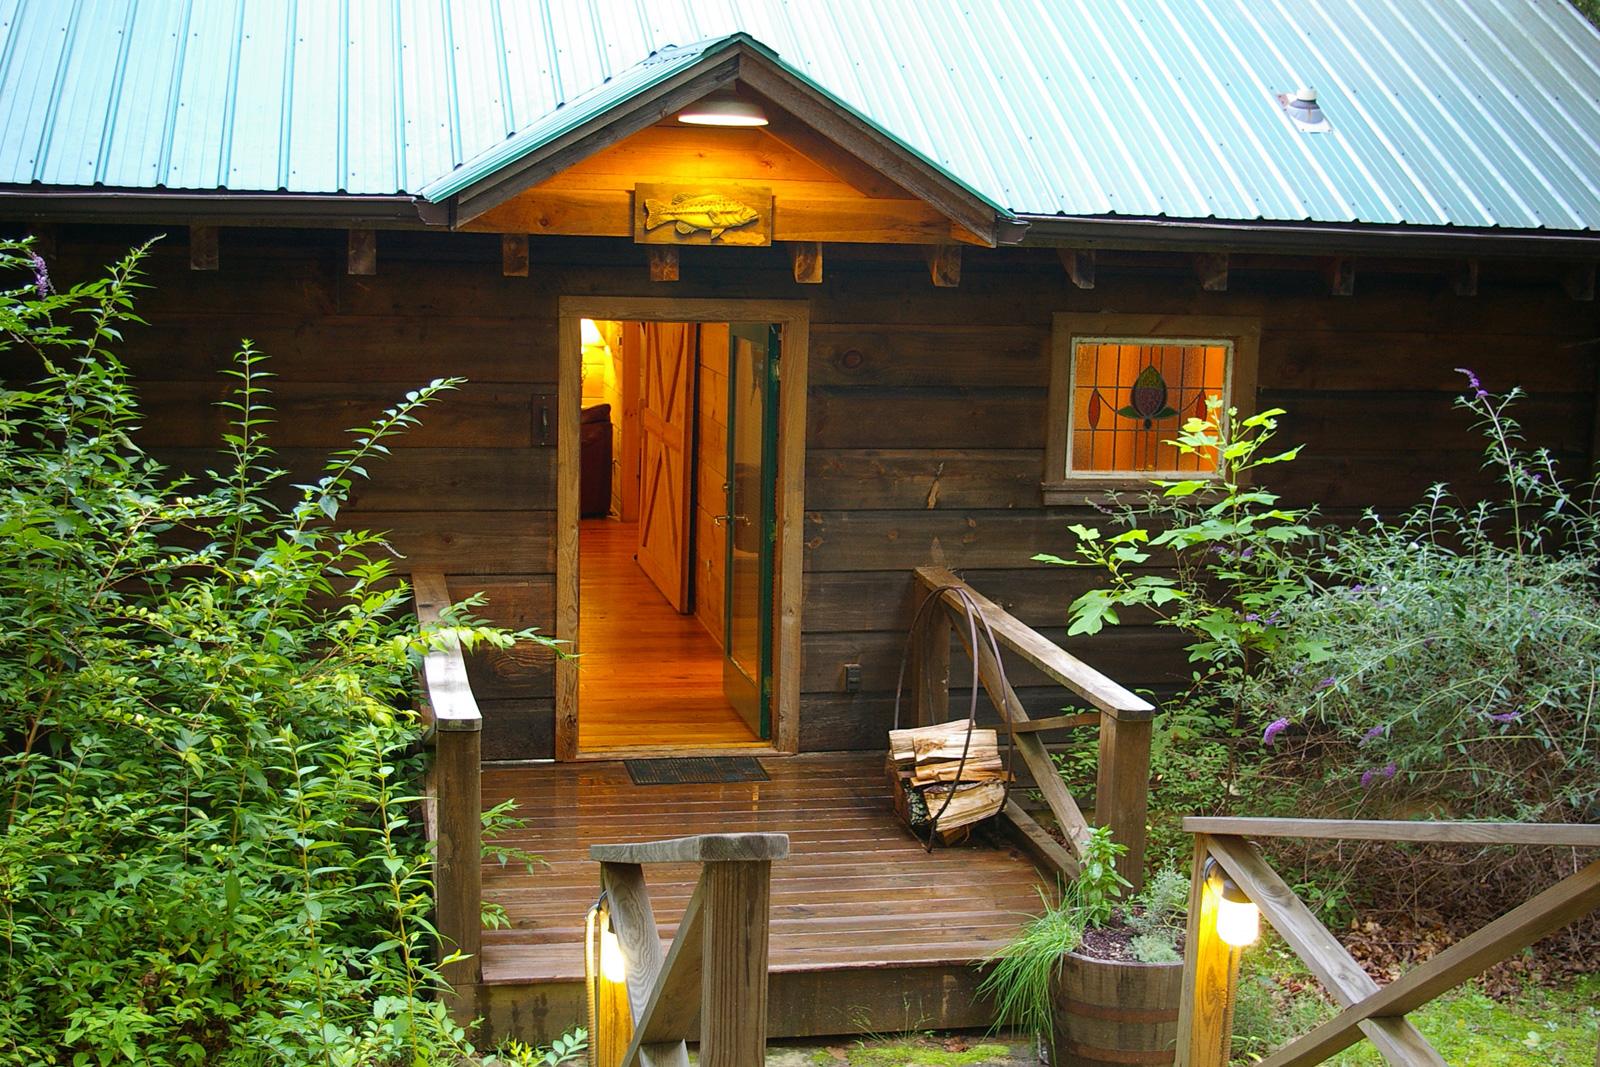 porch side at cabins the cabin rock esmeralda of listing chimney inn dsc